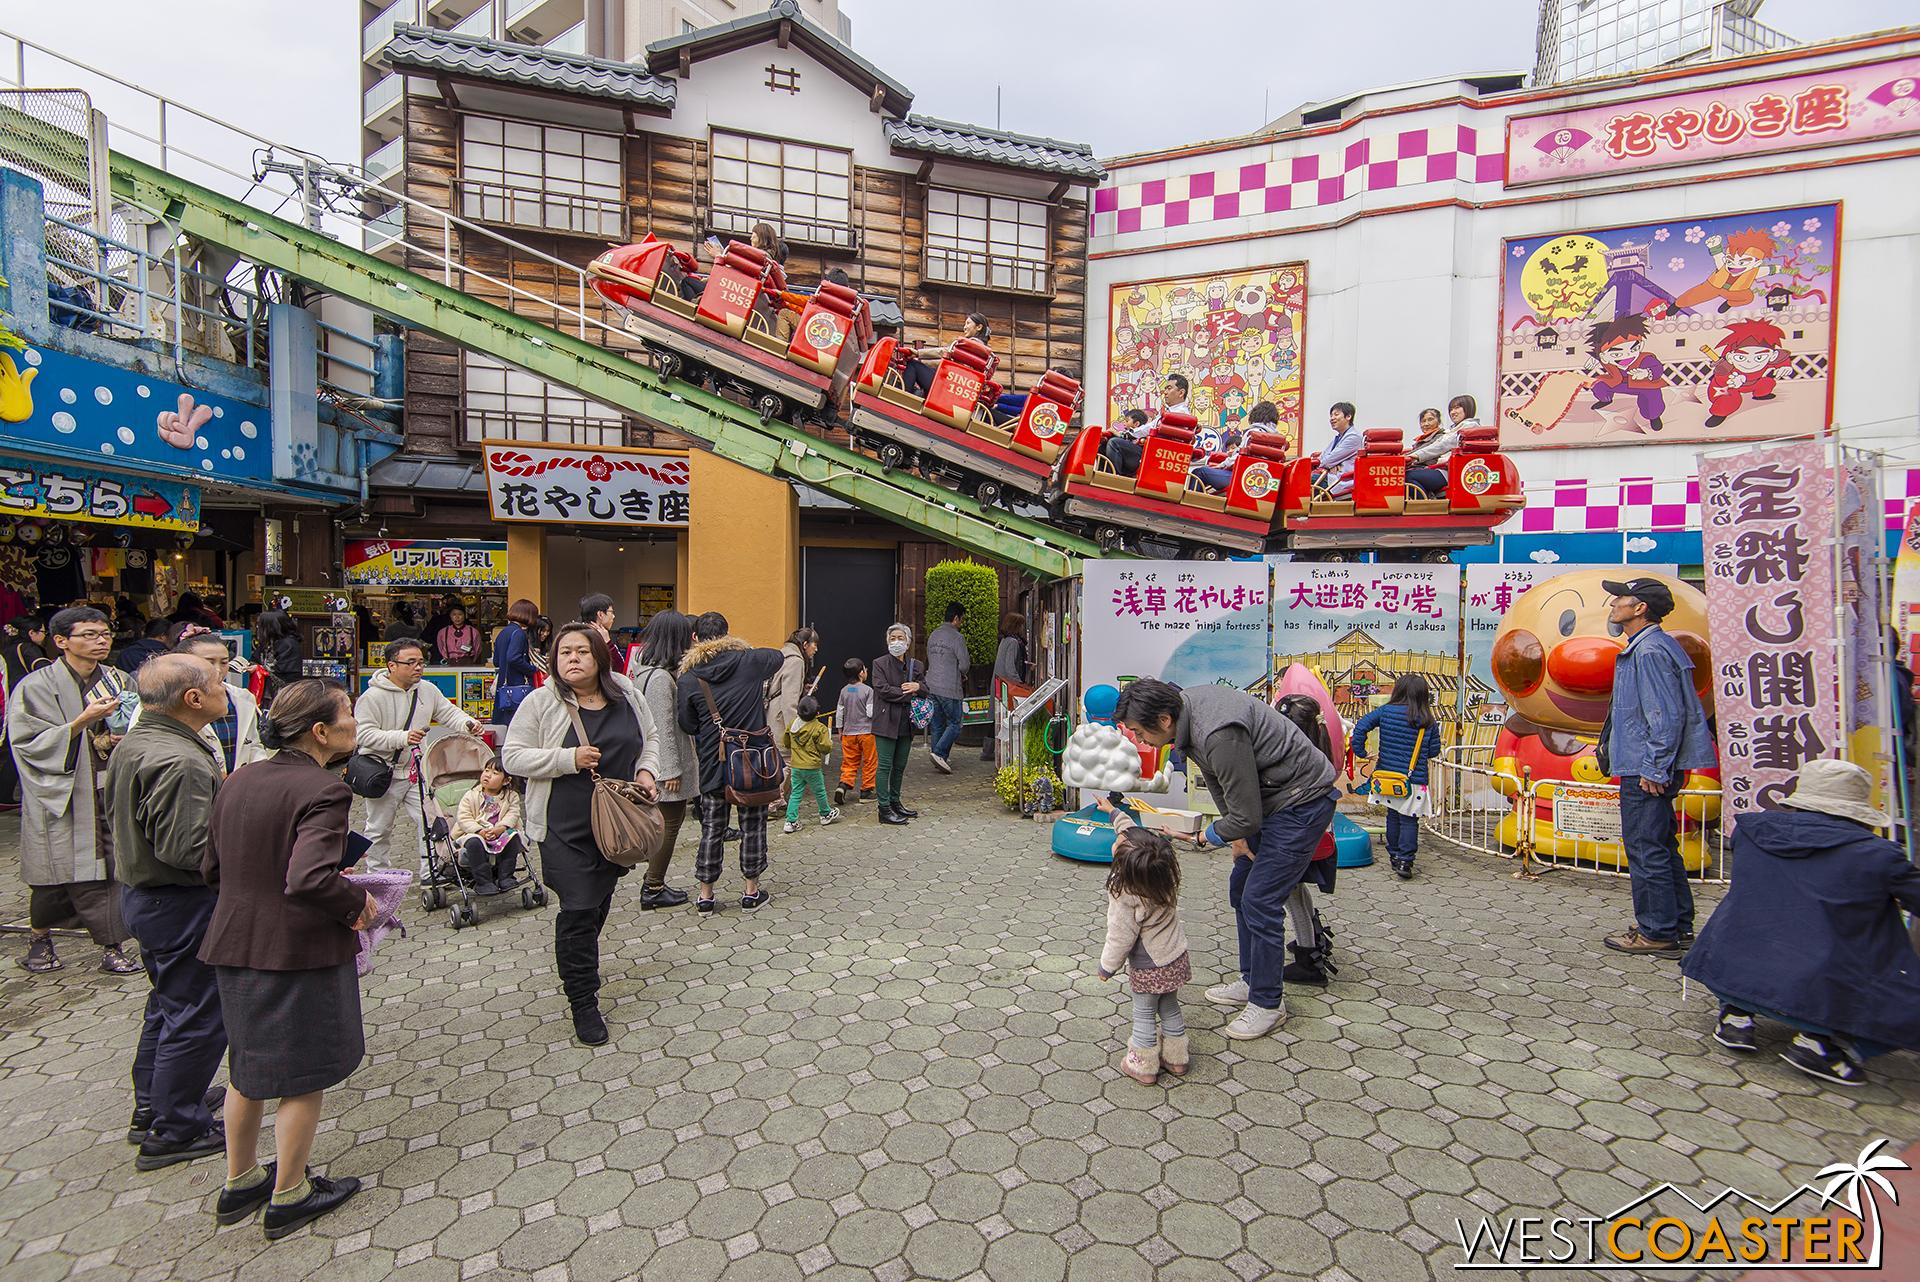 Roller Coaster is a prime attraction at Hanayashiki.